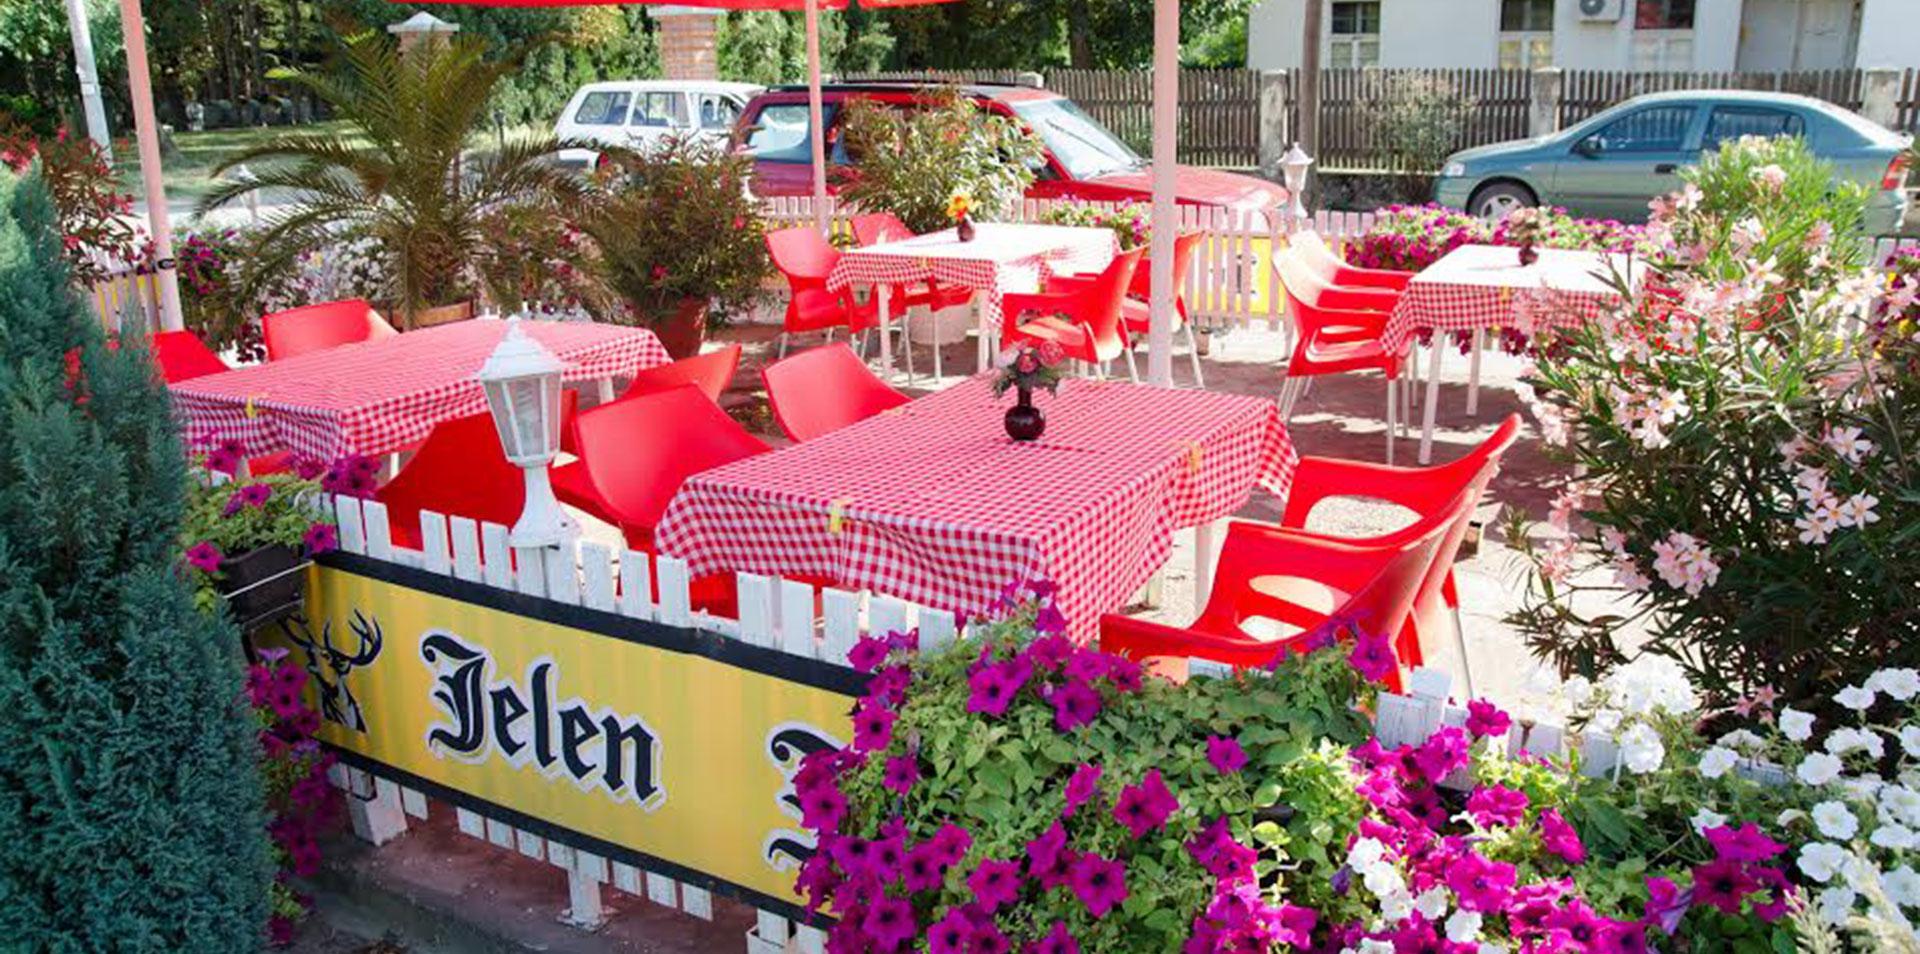 Restoran Strelac